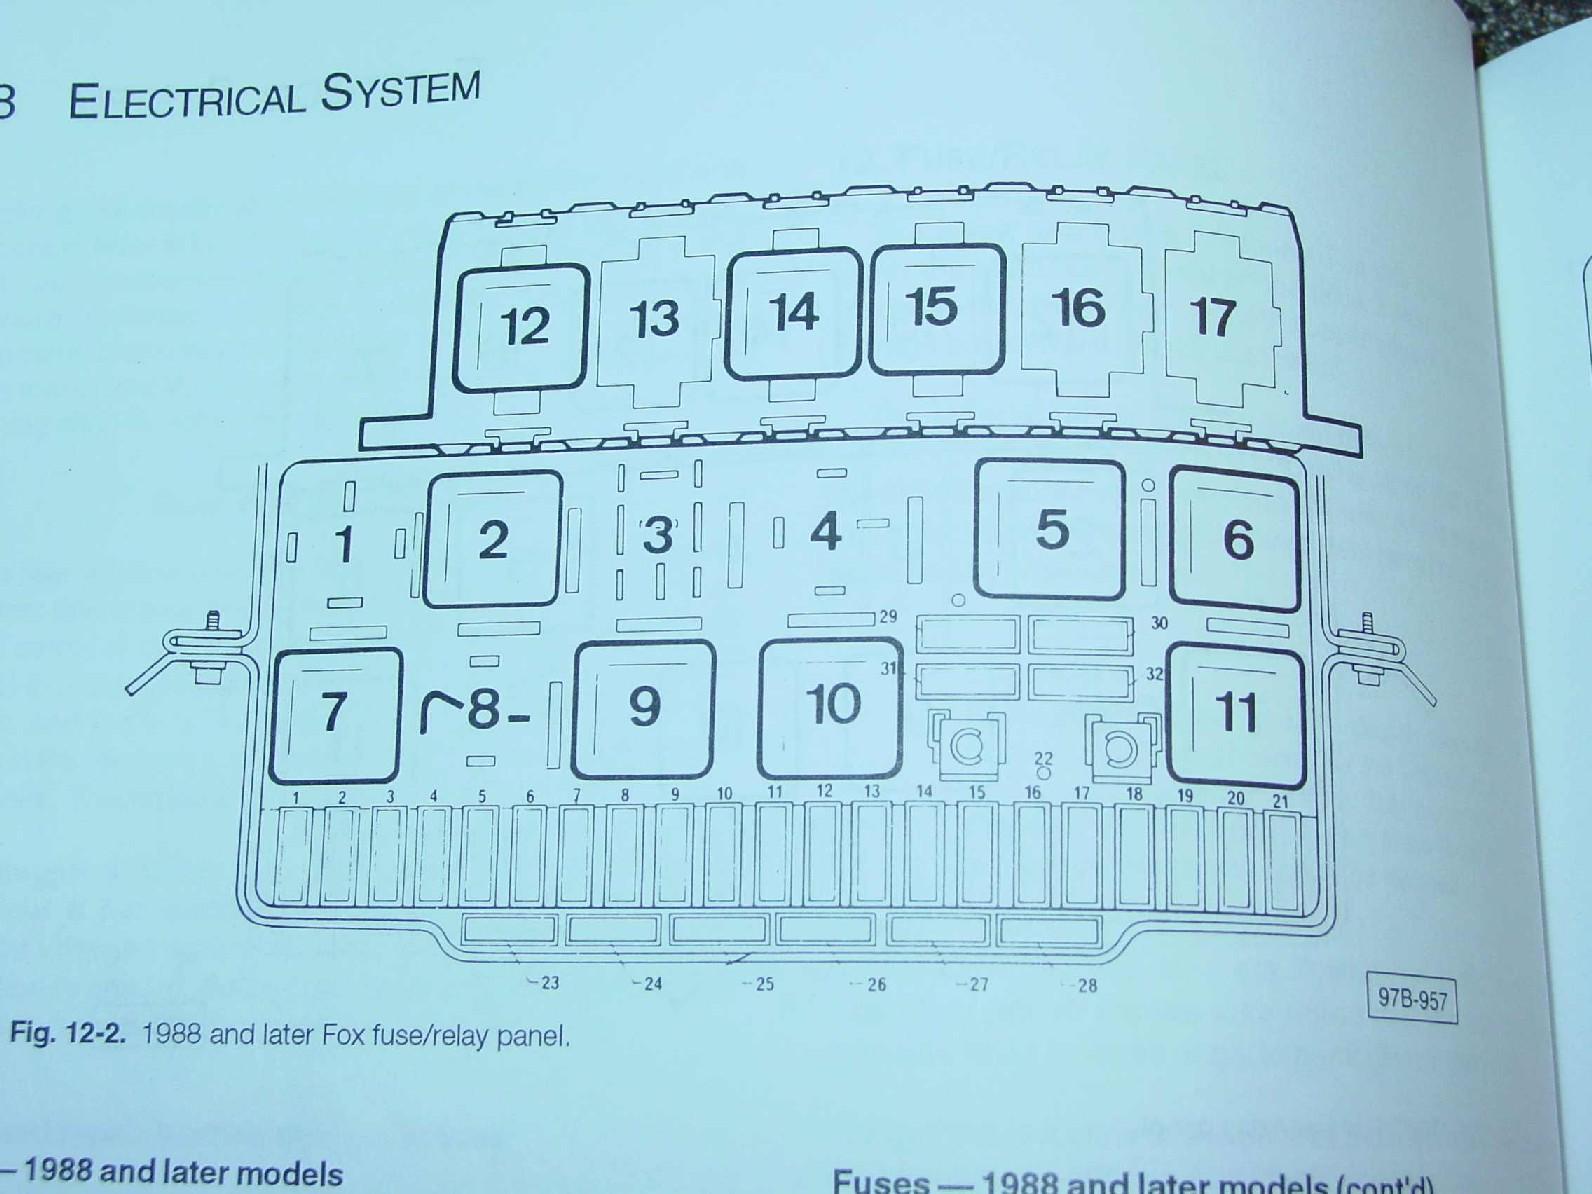 [DIAGRAM_5UK]  OX_3282] 88 Volkswagen Fox Fuse Box Diagram Wiring Diagram | Fox Fuse Box |  | Aspi Hendil Denli Ntnes Xeira Mohammedshrine Librar Wiring 101